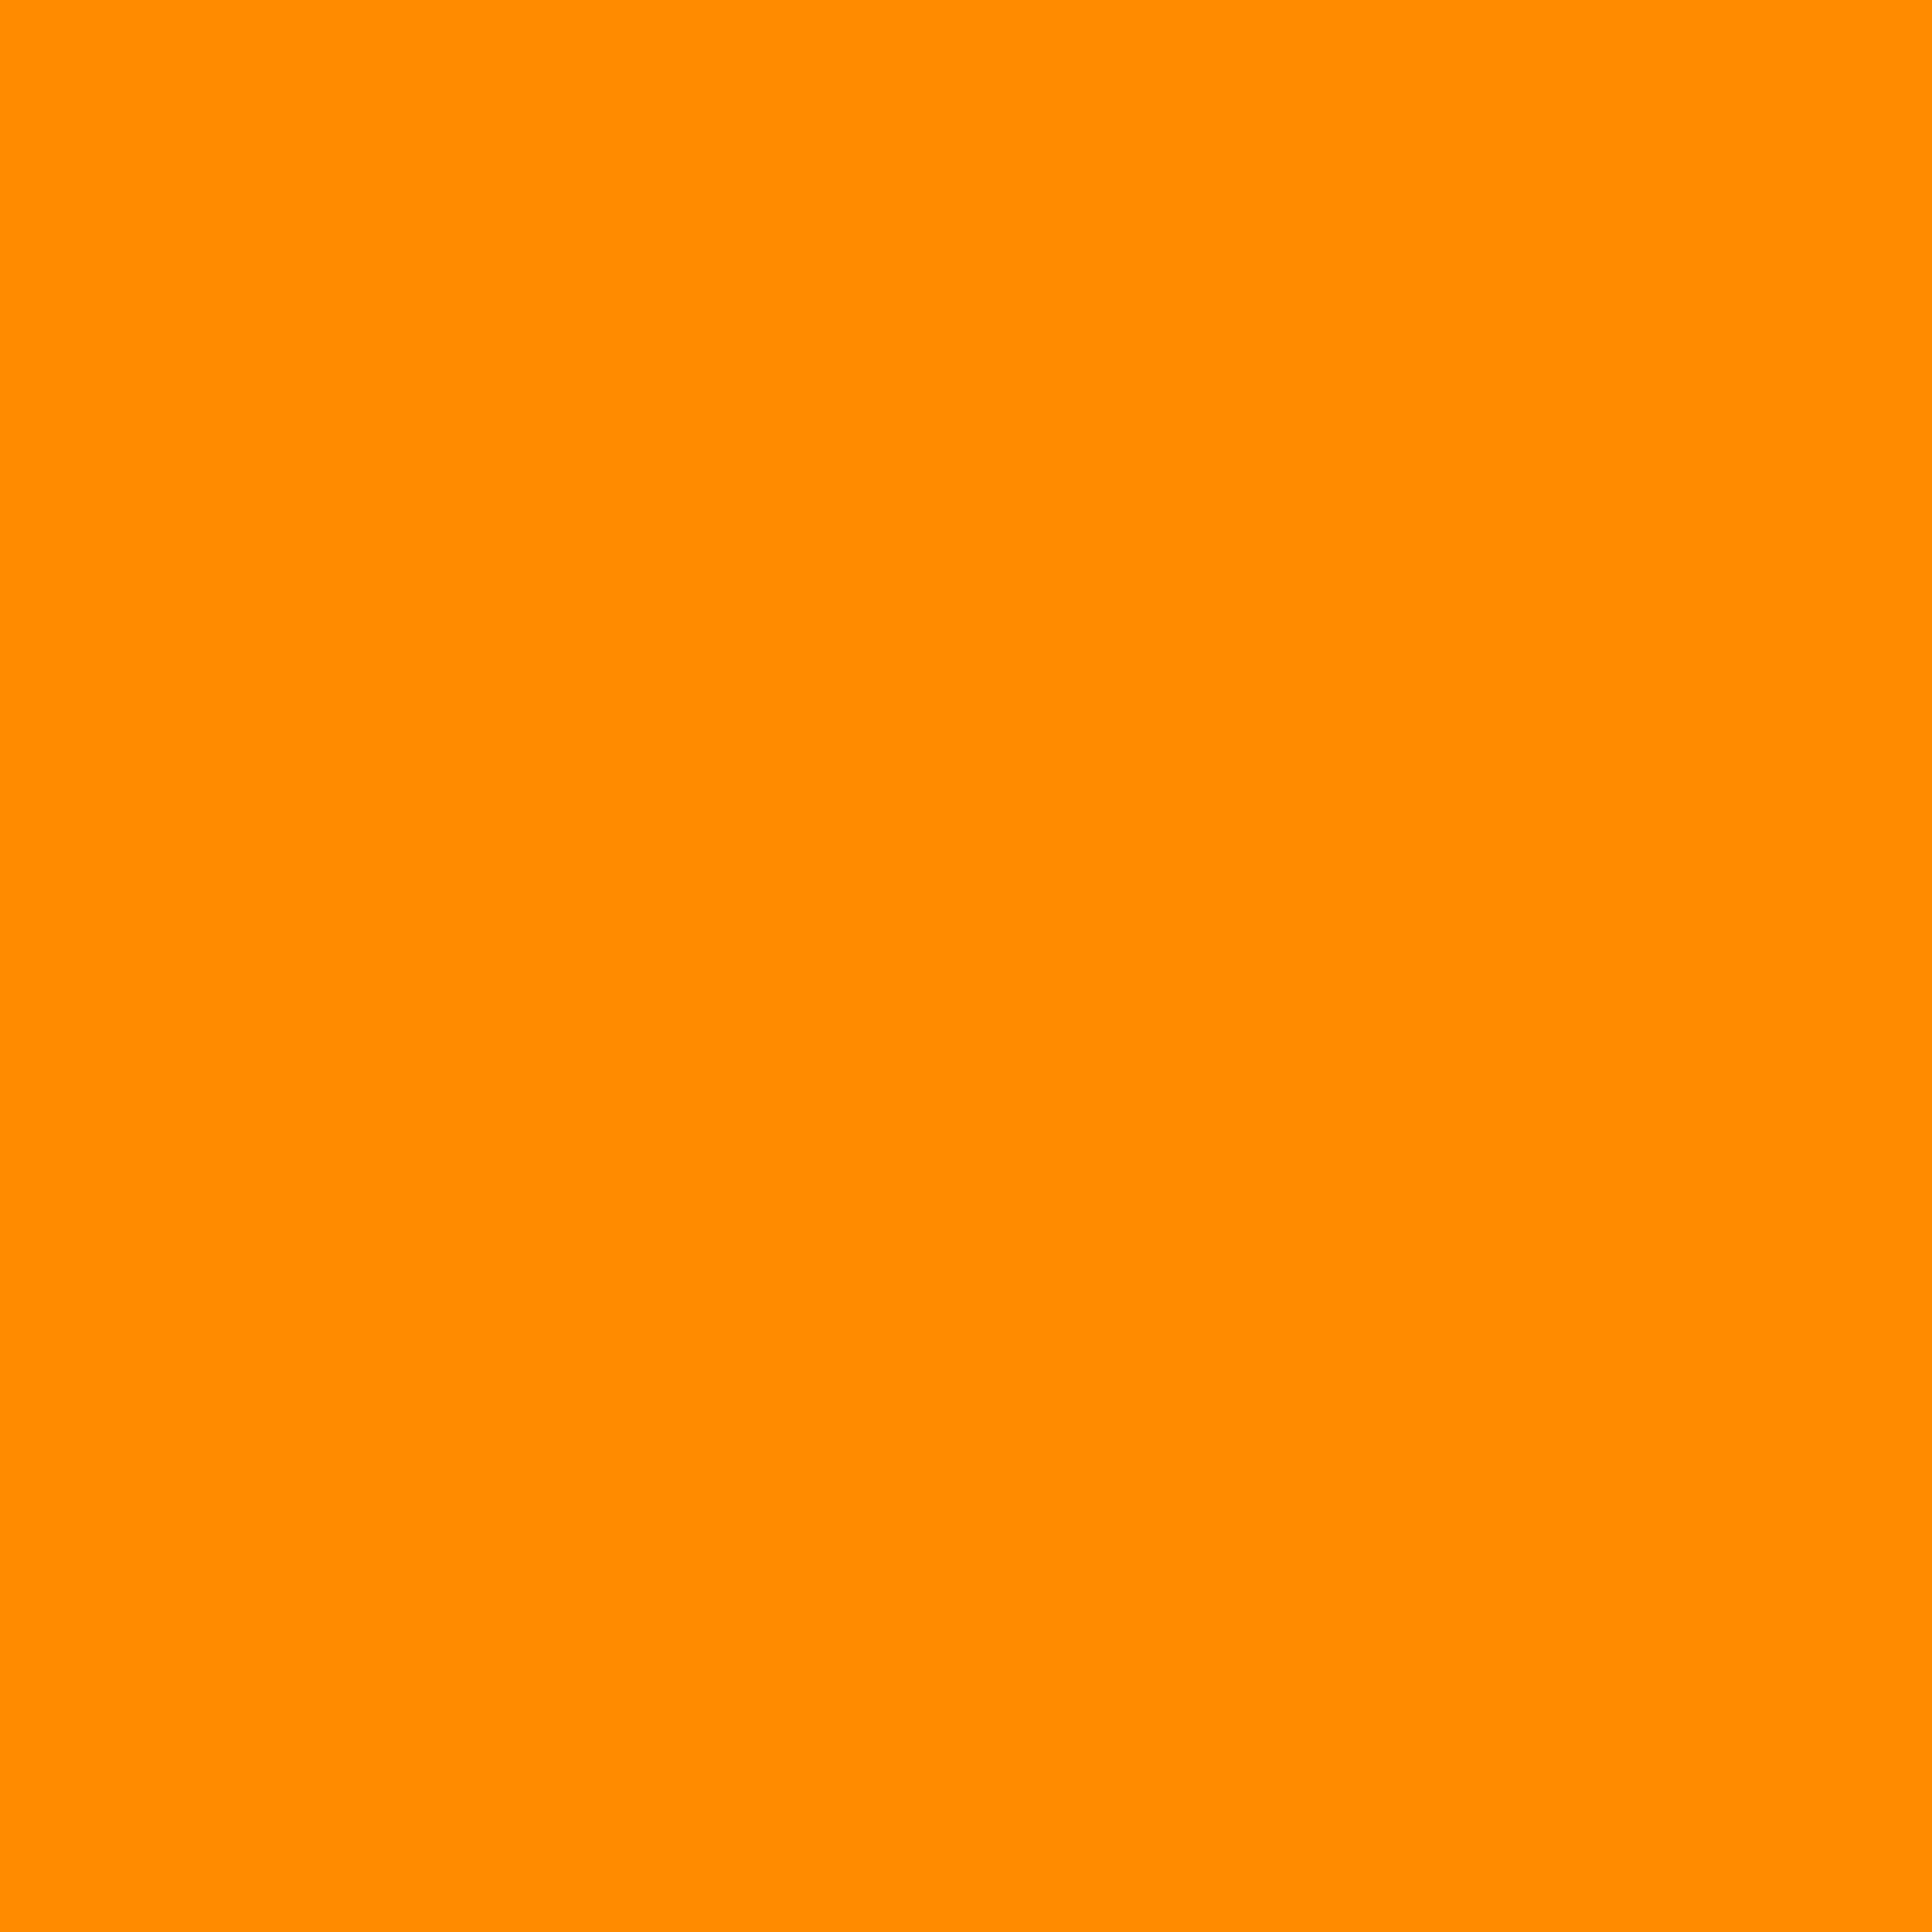 2048x2048 Dark Orange Solid Color Background